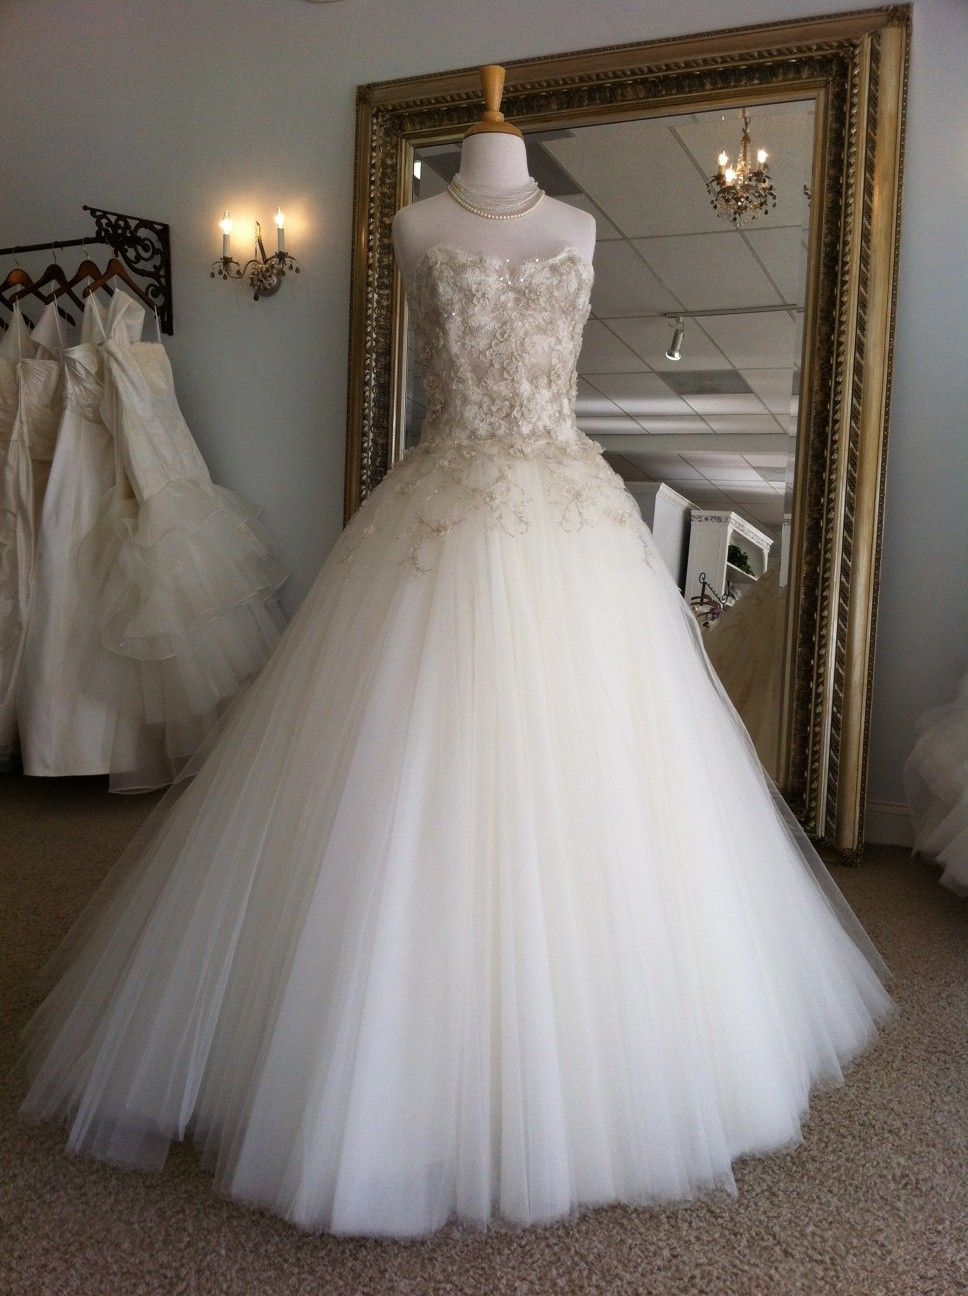 Fairy tale wedding dress dresses to make pinterest for Fairy tale wedding dresses